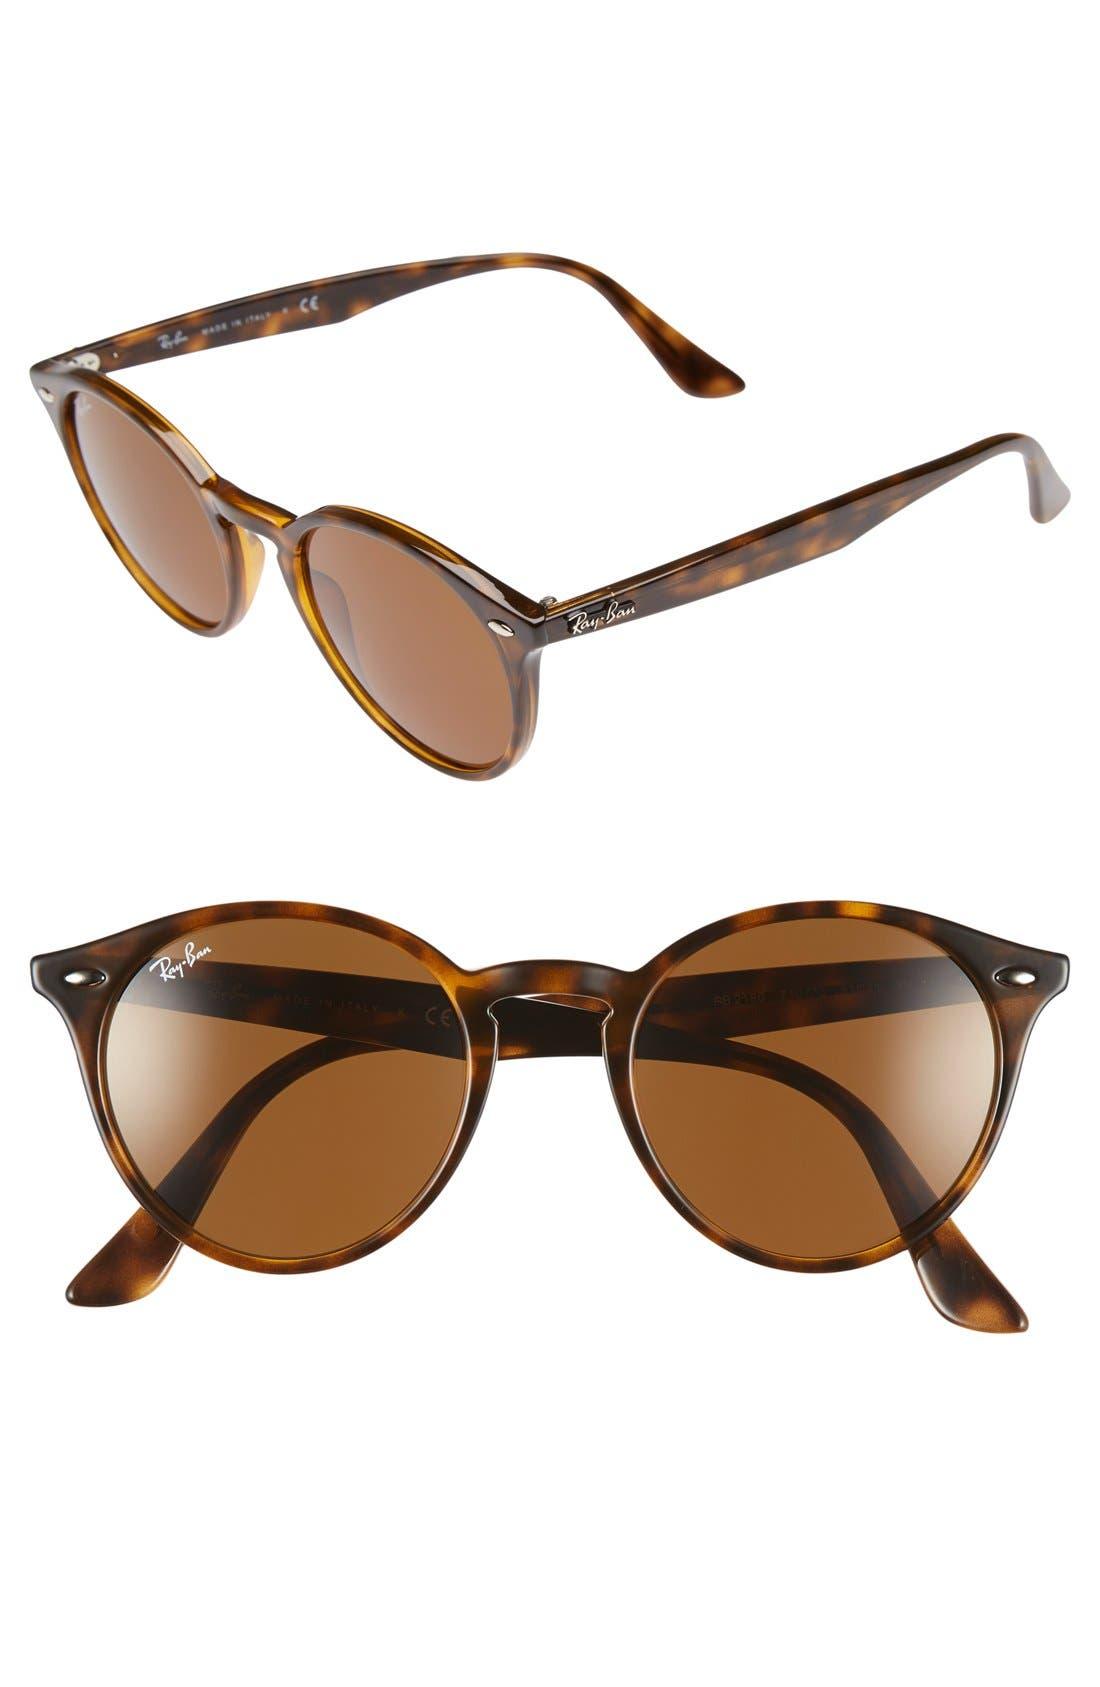 Main Image - Ray-Ban Highstreet 51mm Round Sunglasses